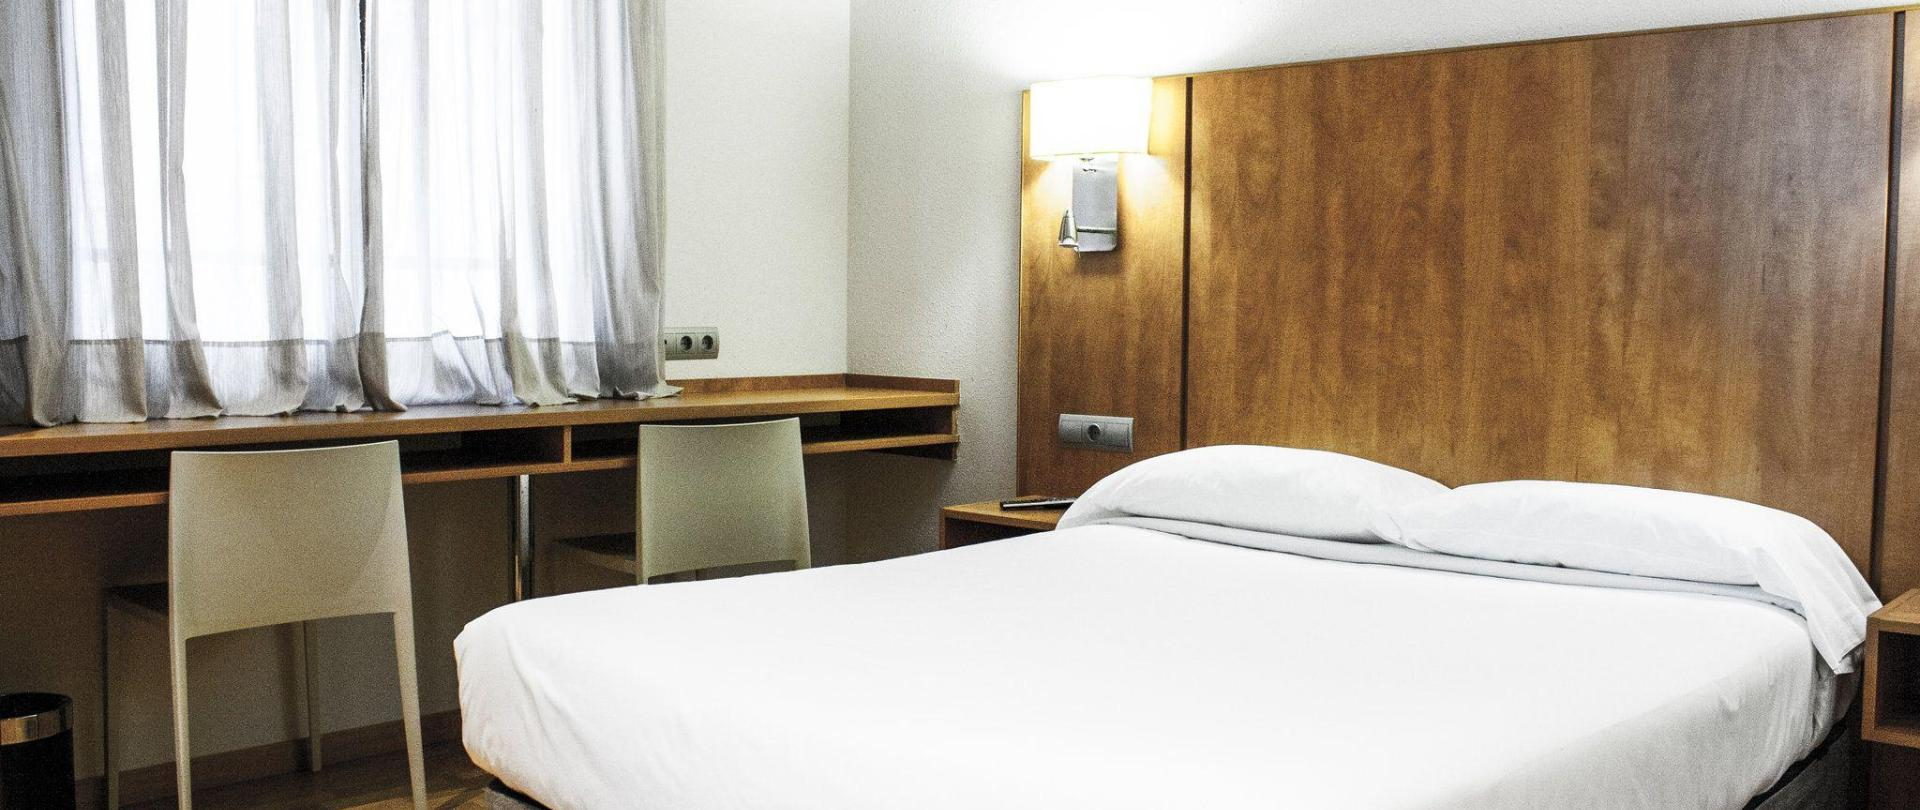 habitaici-n-112_8.jpg